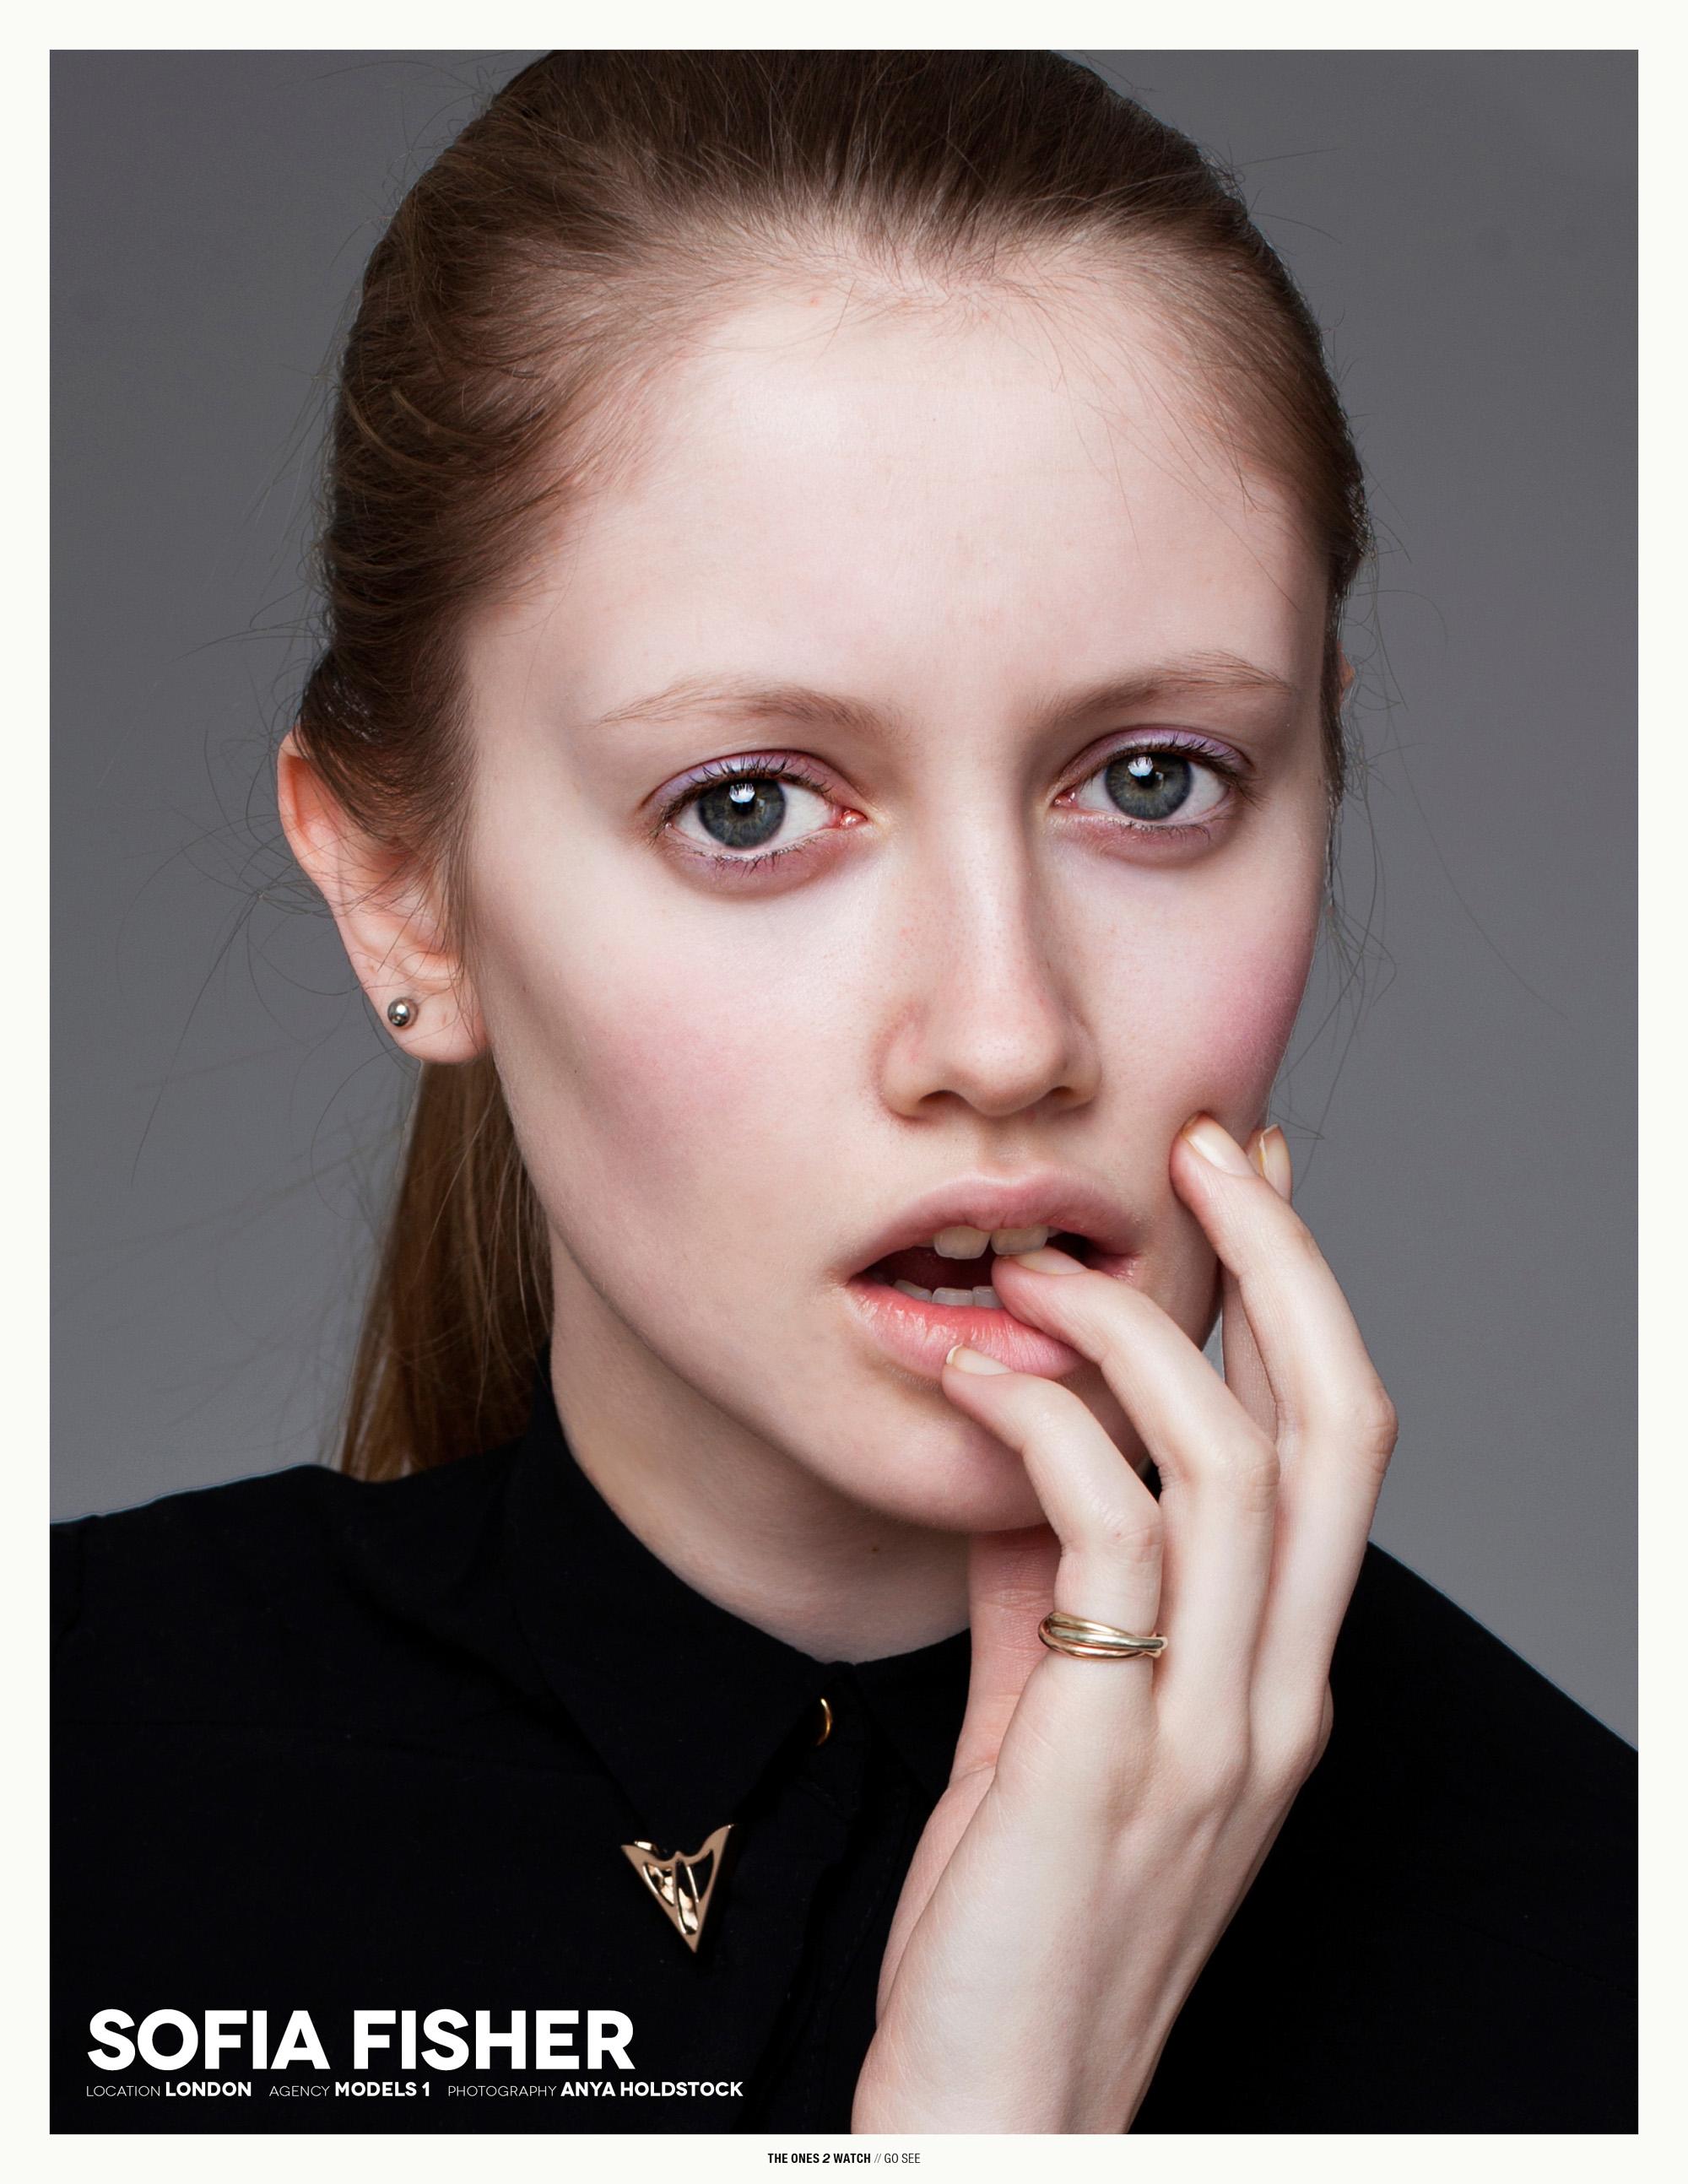 gosee-london-sofia@models1-anyaholdstock